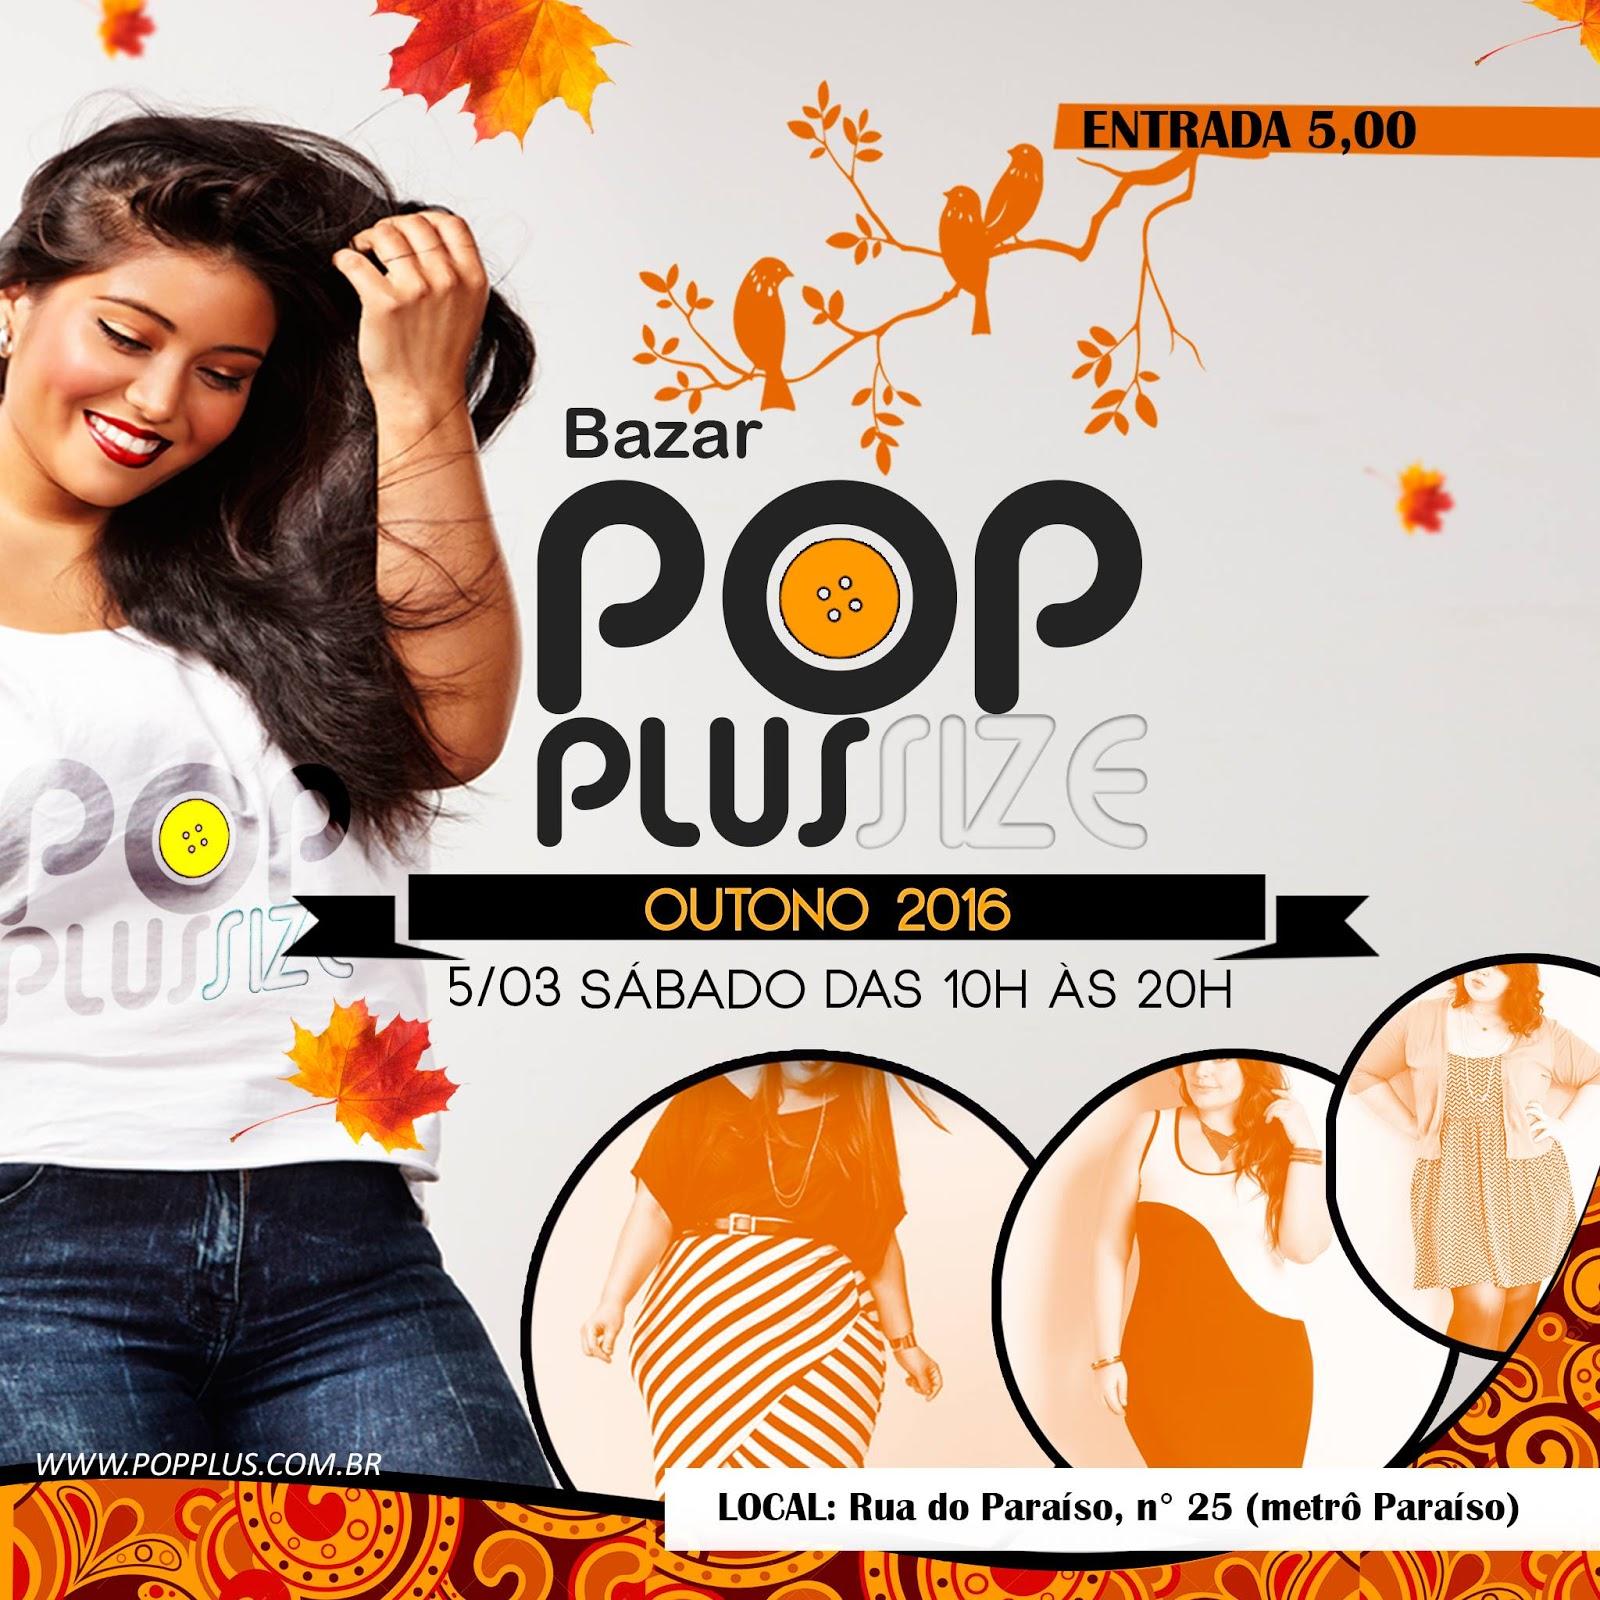 8b97ea743 Bazar Pop Plus Size oferece moda jovem